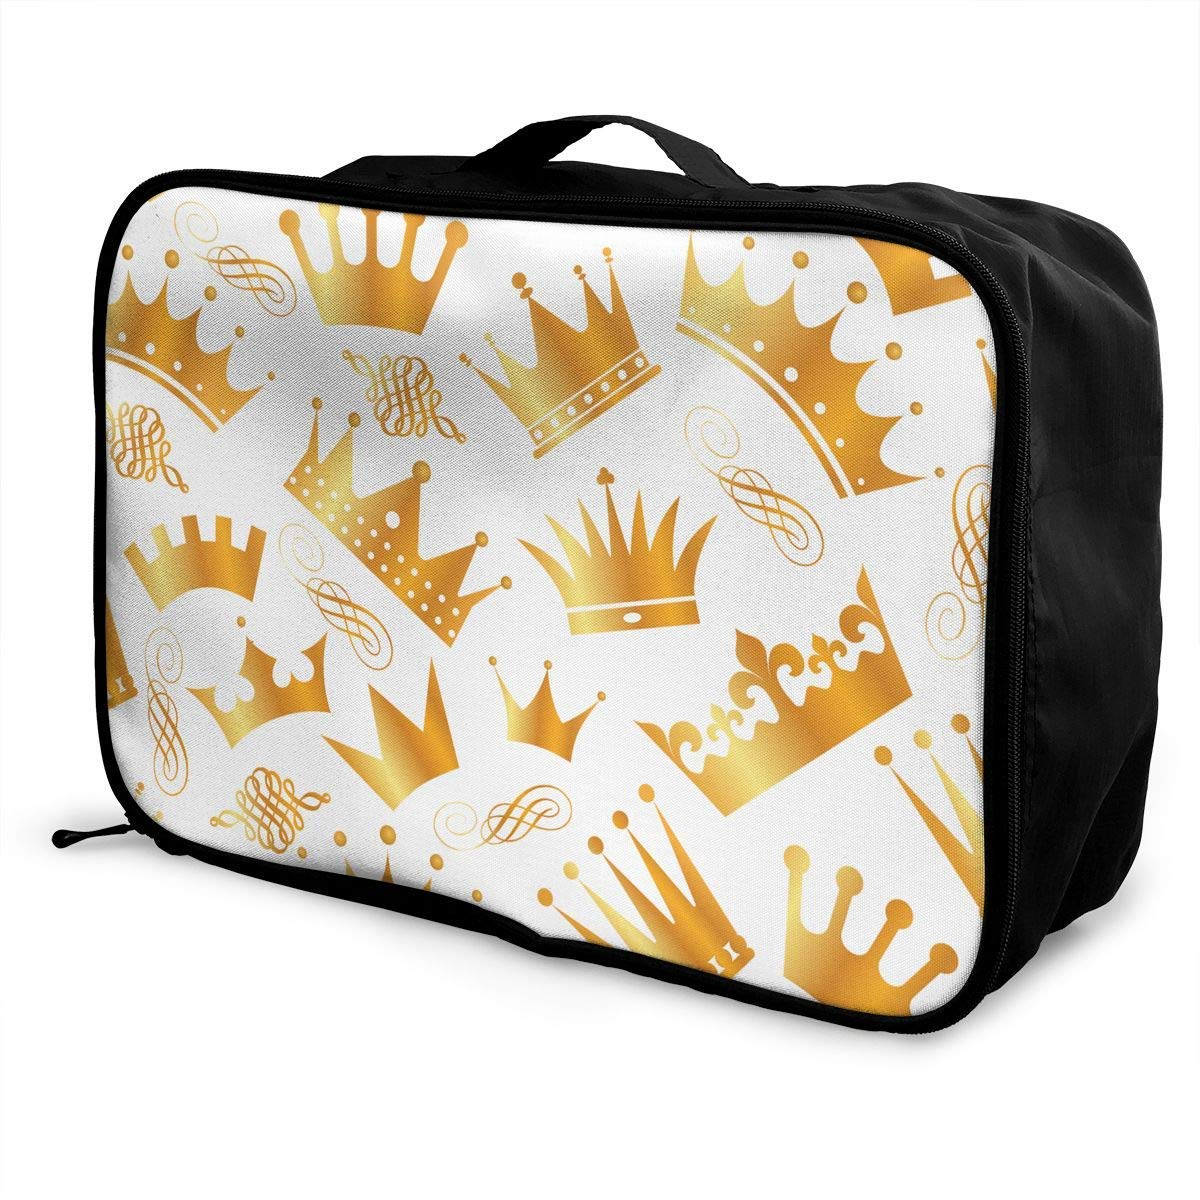 JTRVW Luggage Bags for Travel Travel Duffel Bag Waterproof Fashion Lightweight Large Capacity Portable Duffel Bag for Men /& Women Gold Crown